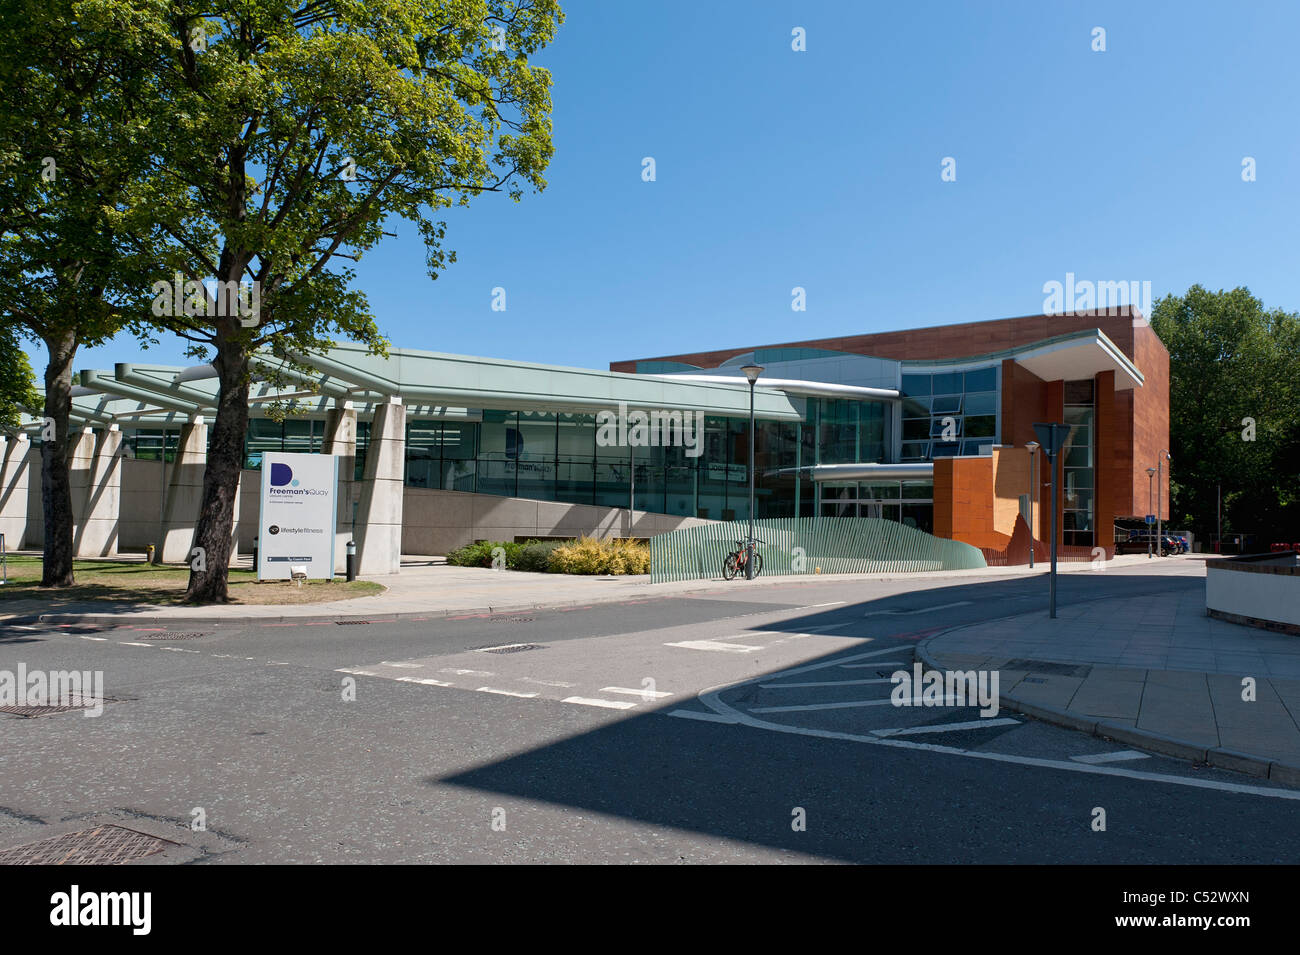 Freeman S Quay Leisure Centre Durham Stock Photo 37558269 Alamy